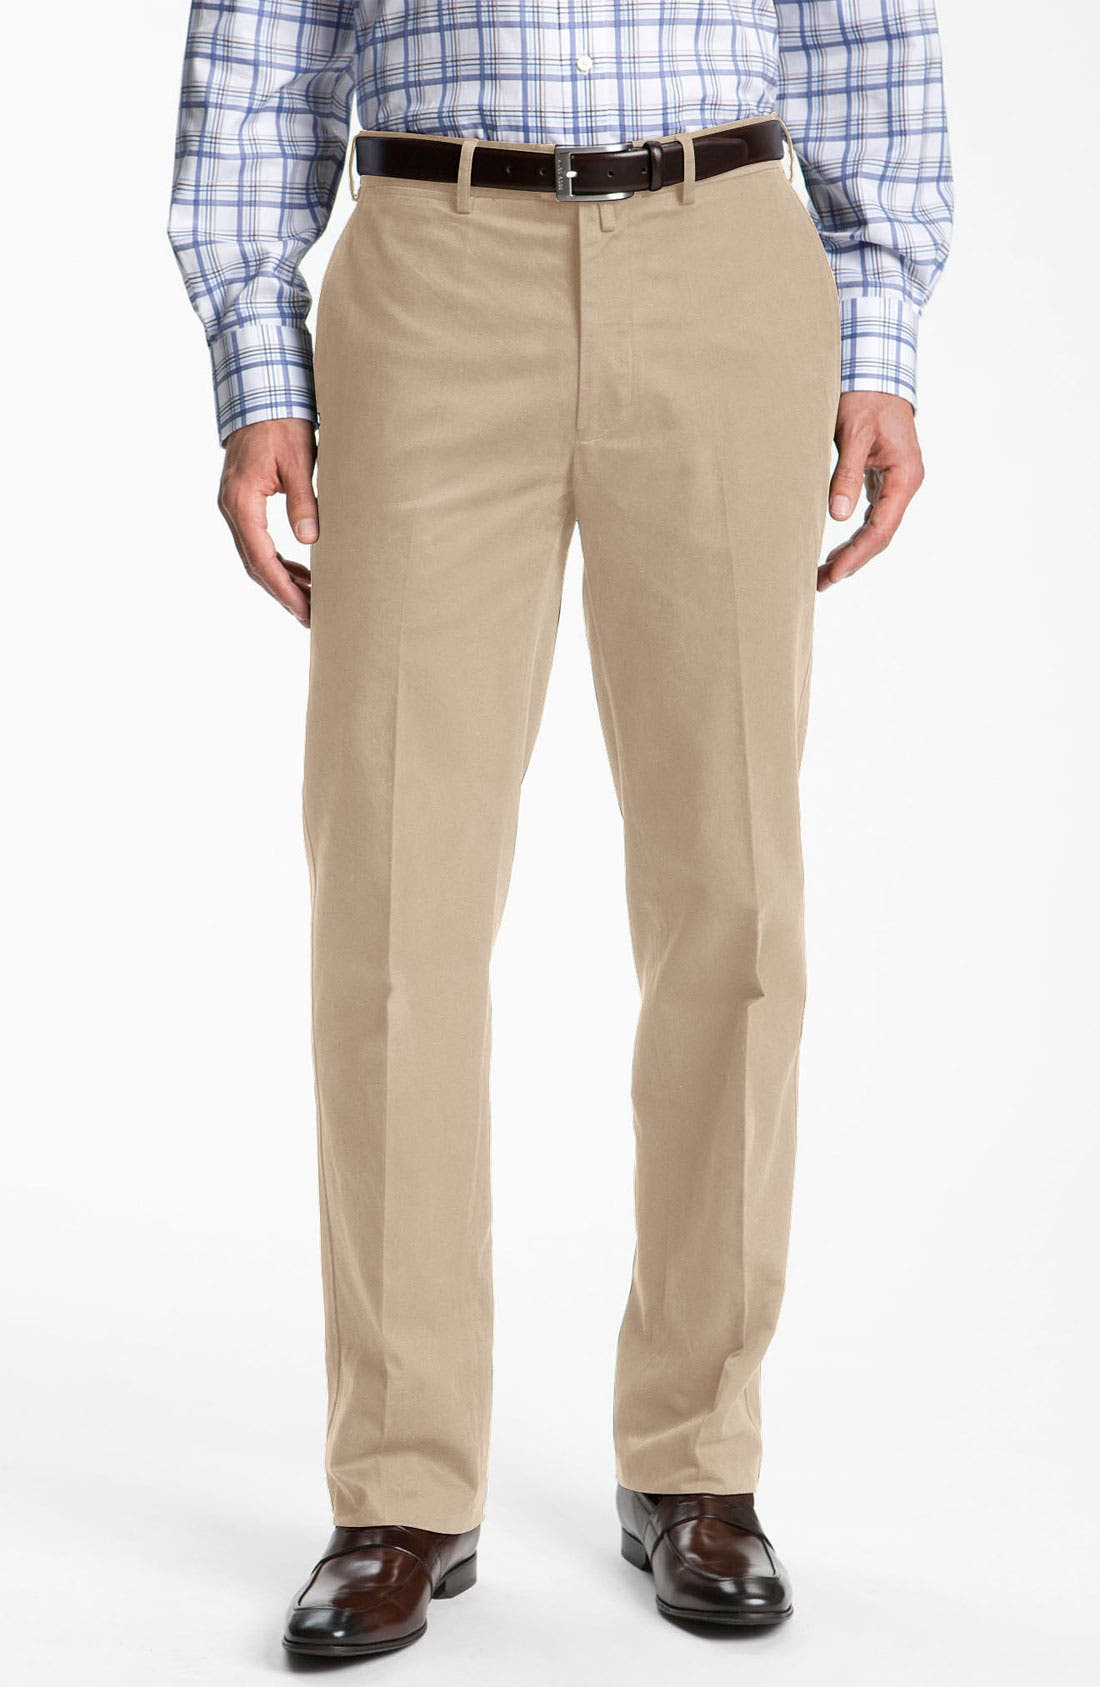 Alternate Image 1 Selected - Façonnable 'Savon' Flat Front Cotton Trousers